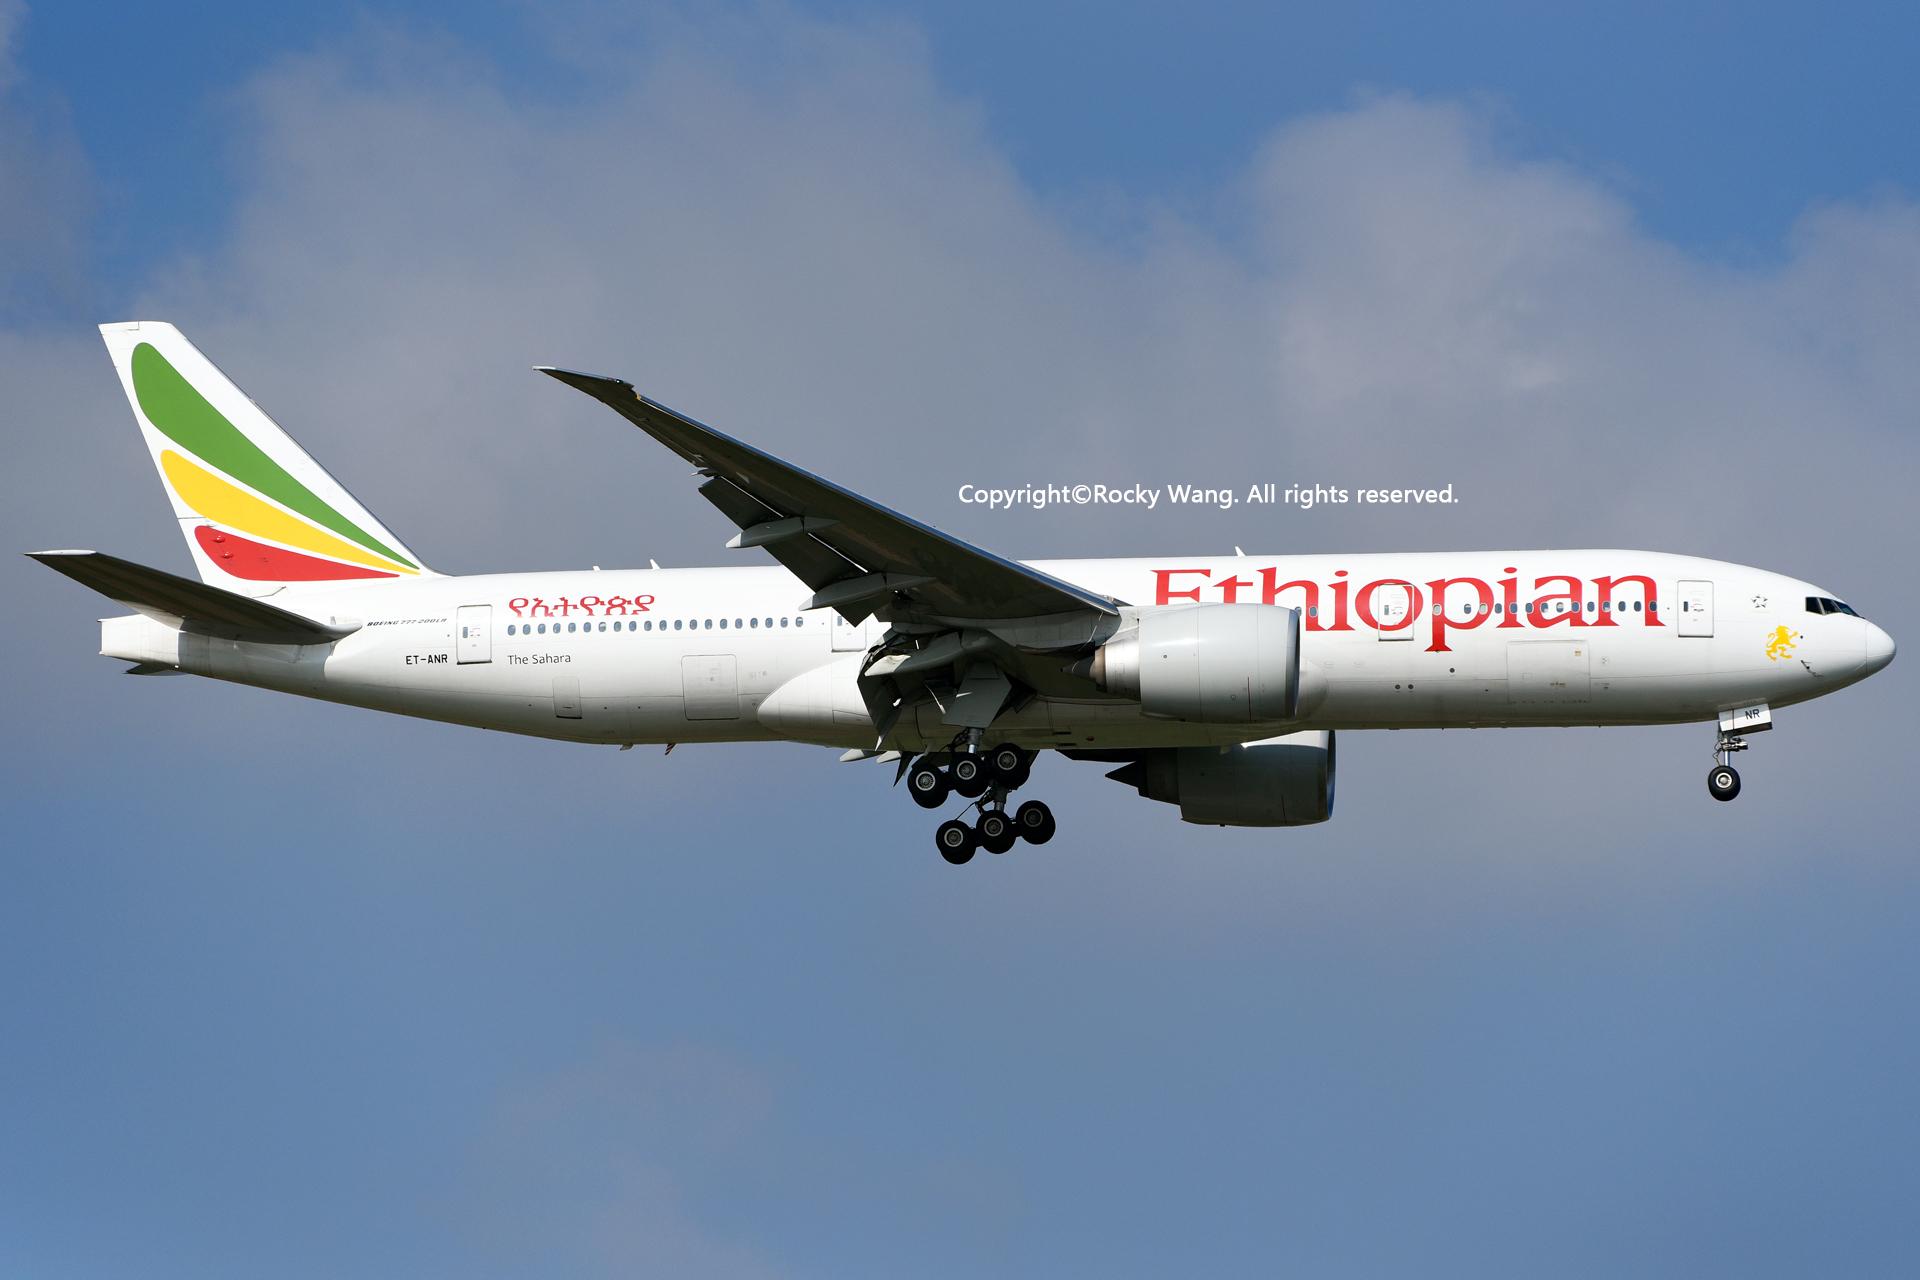 Re:[原创]居家了 批量处理老图 倾情奉献52家777 BOEING 777-260LR ET-ANR Shanghai Pudong